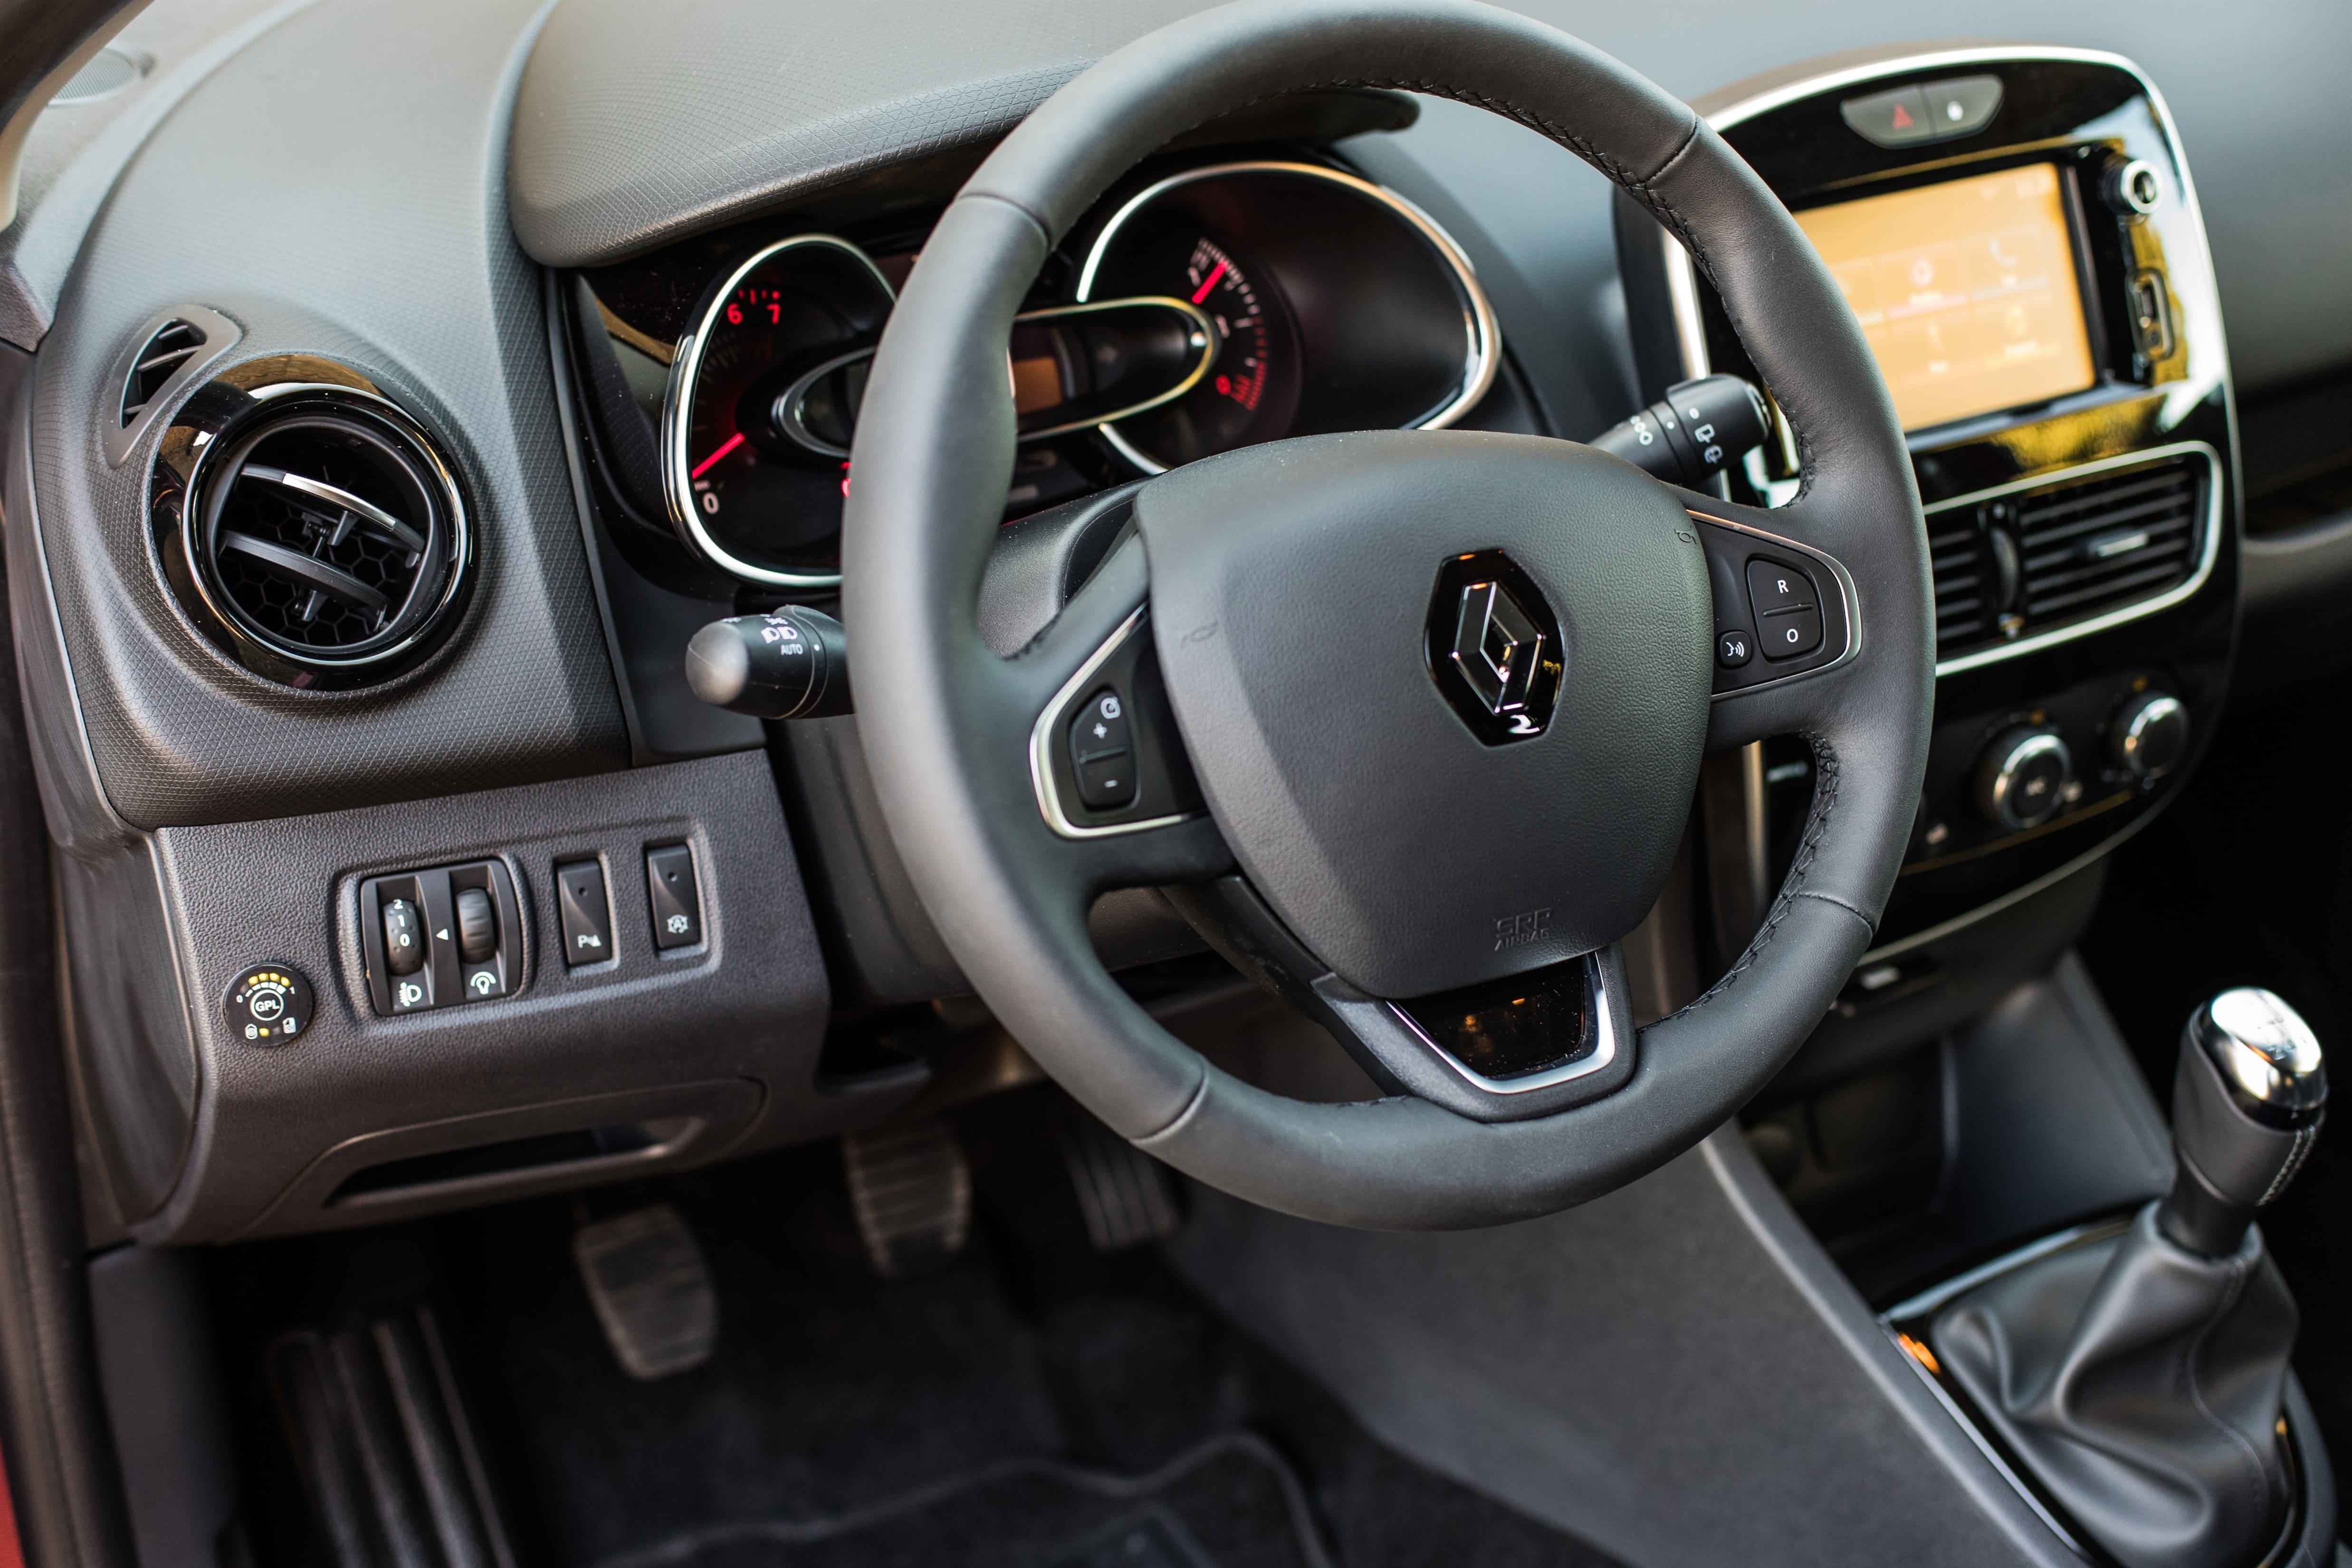 Nuova Renault Clio 2017